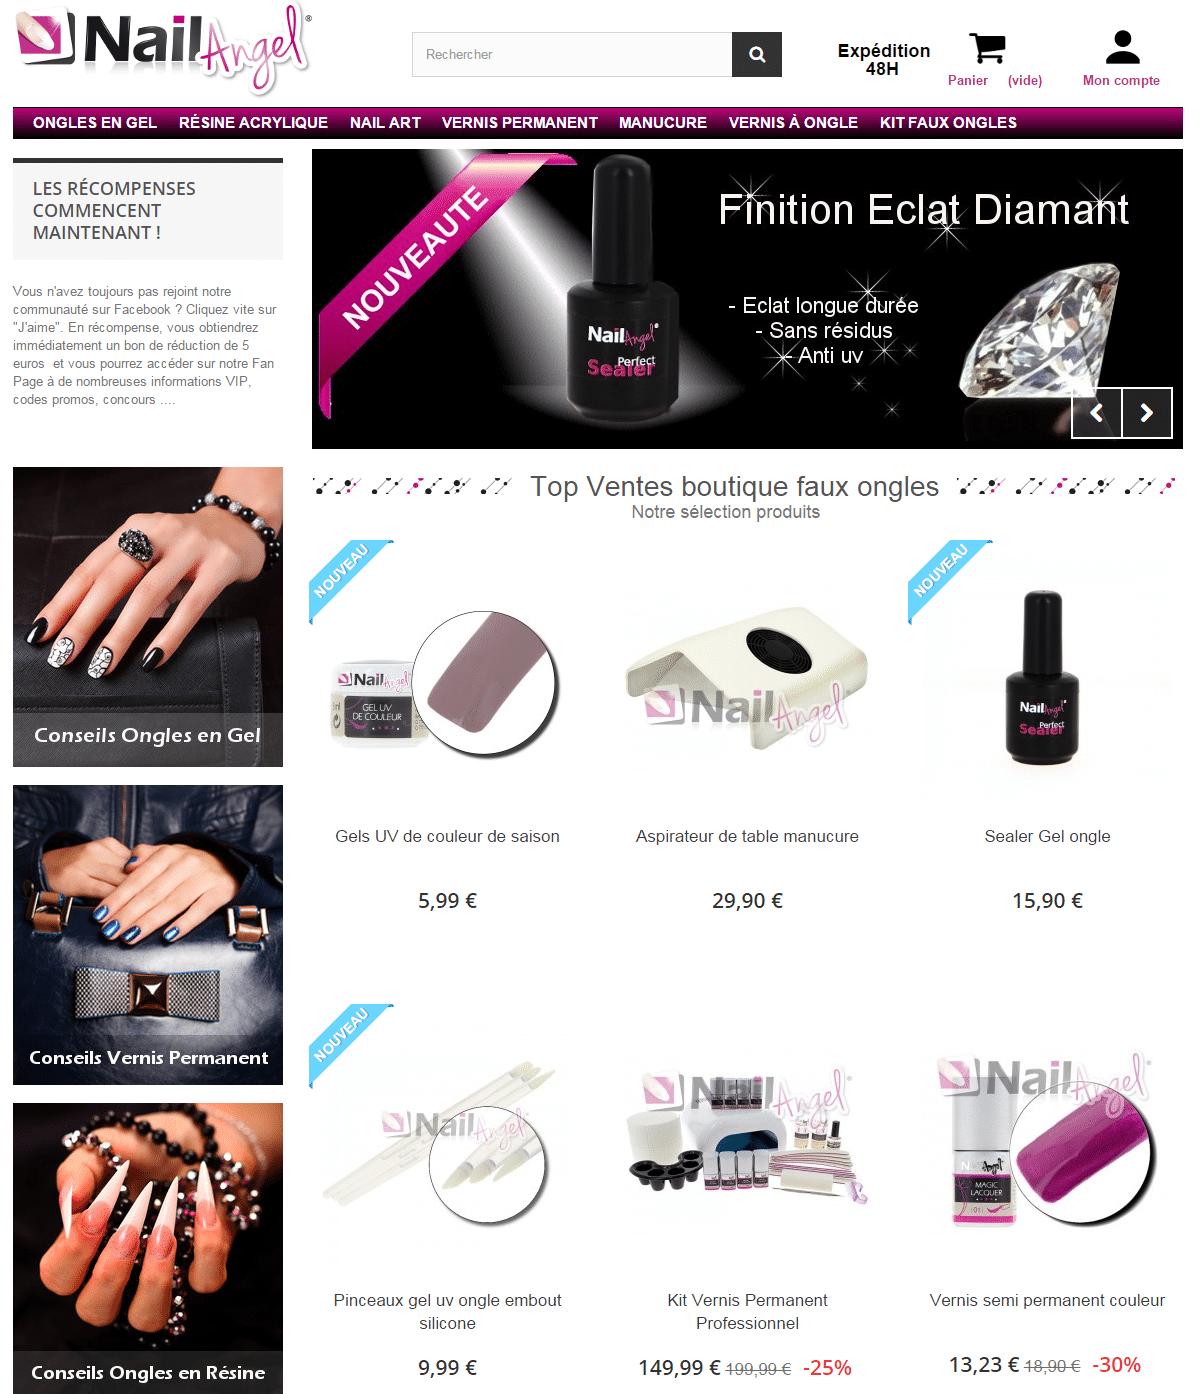 Faux ongles gel faux ongles et produits ongles nails en gel